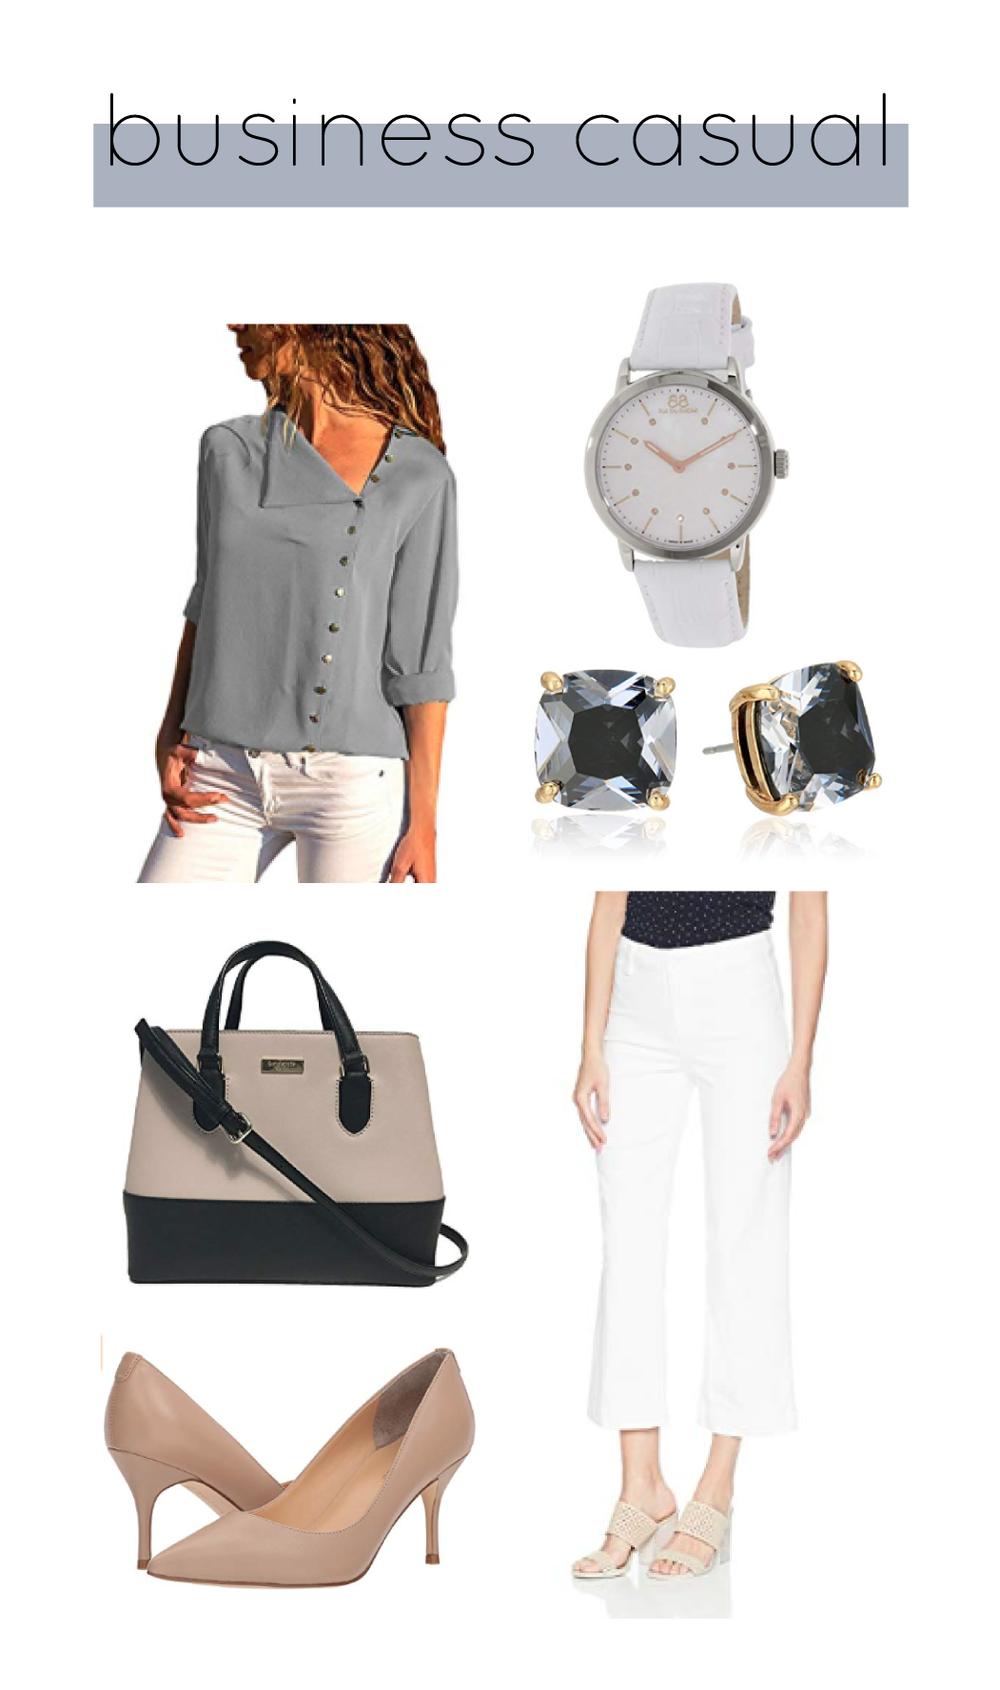 Outfit Details:  Paige Culotte Pants     Jeazi Button Blouse     Kate Spade   Satchel     Ivanka Trump Pumps     Kate Spade Earrings     White Leather Watch